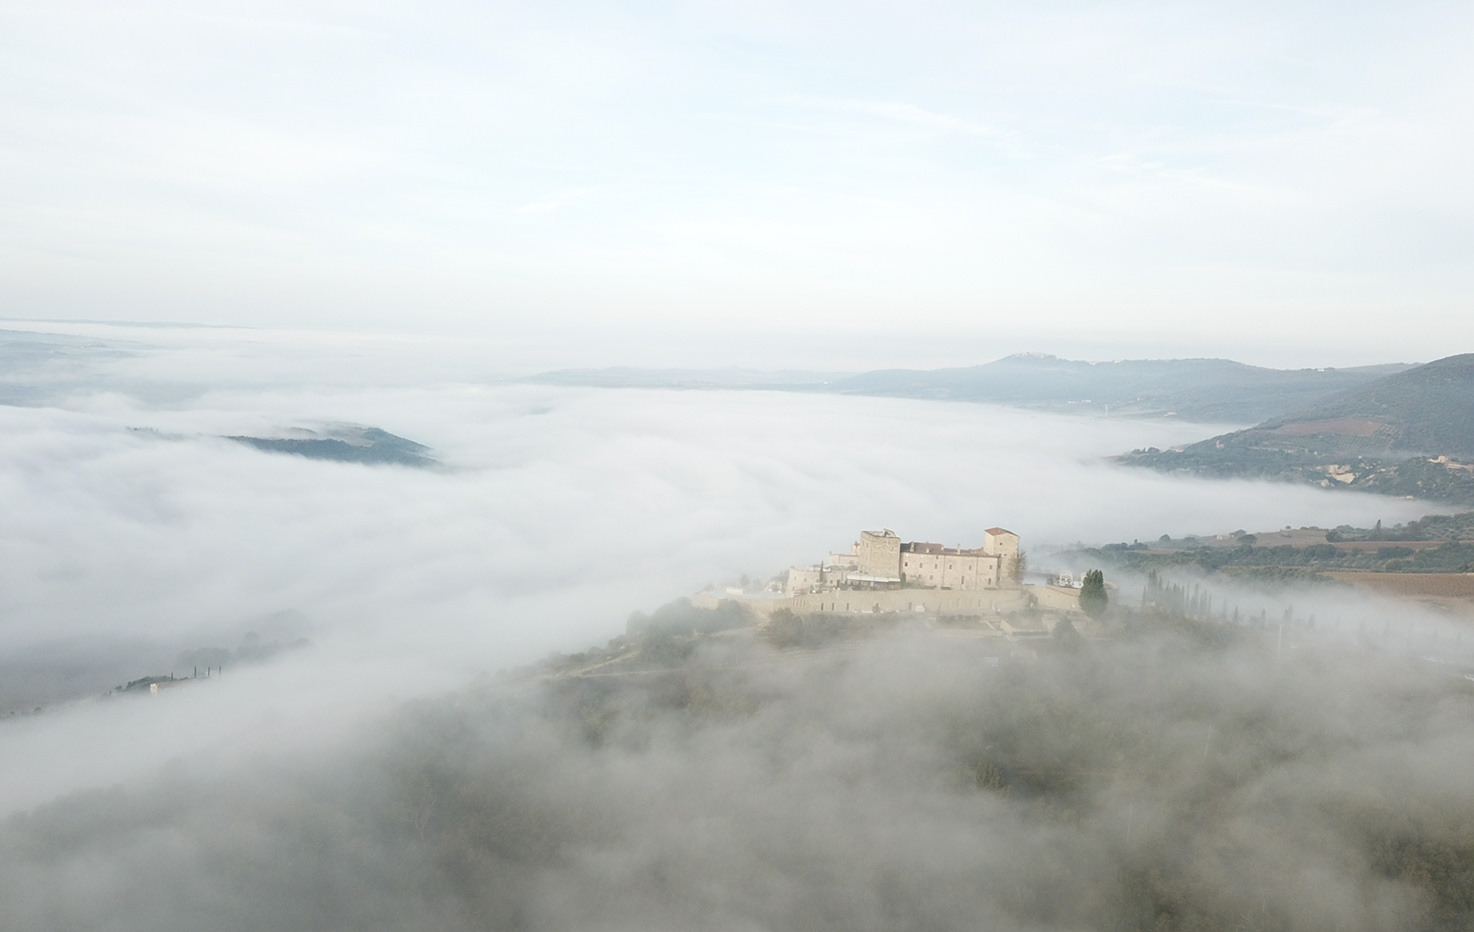 Aerial view of Castello di Velona, Tuscany